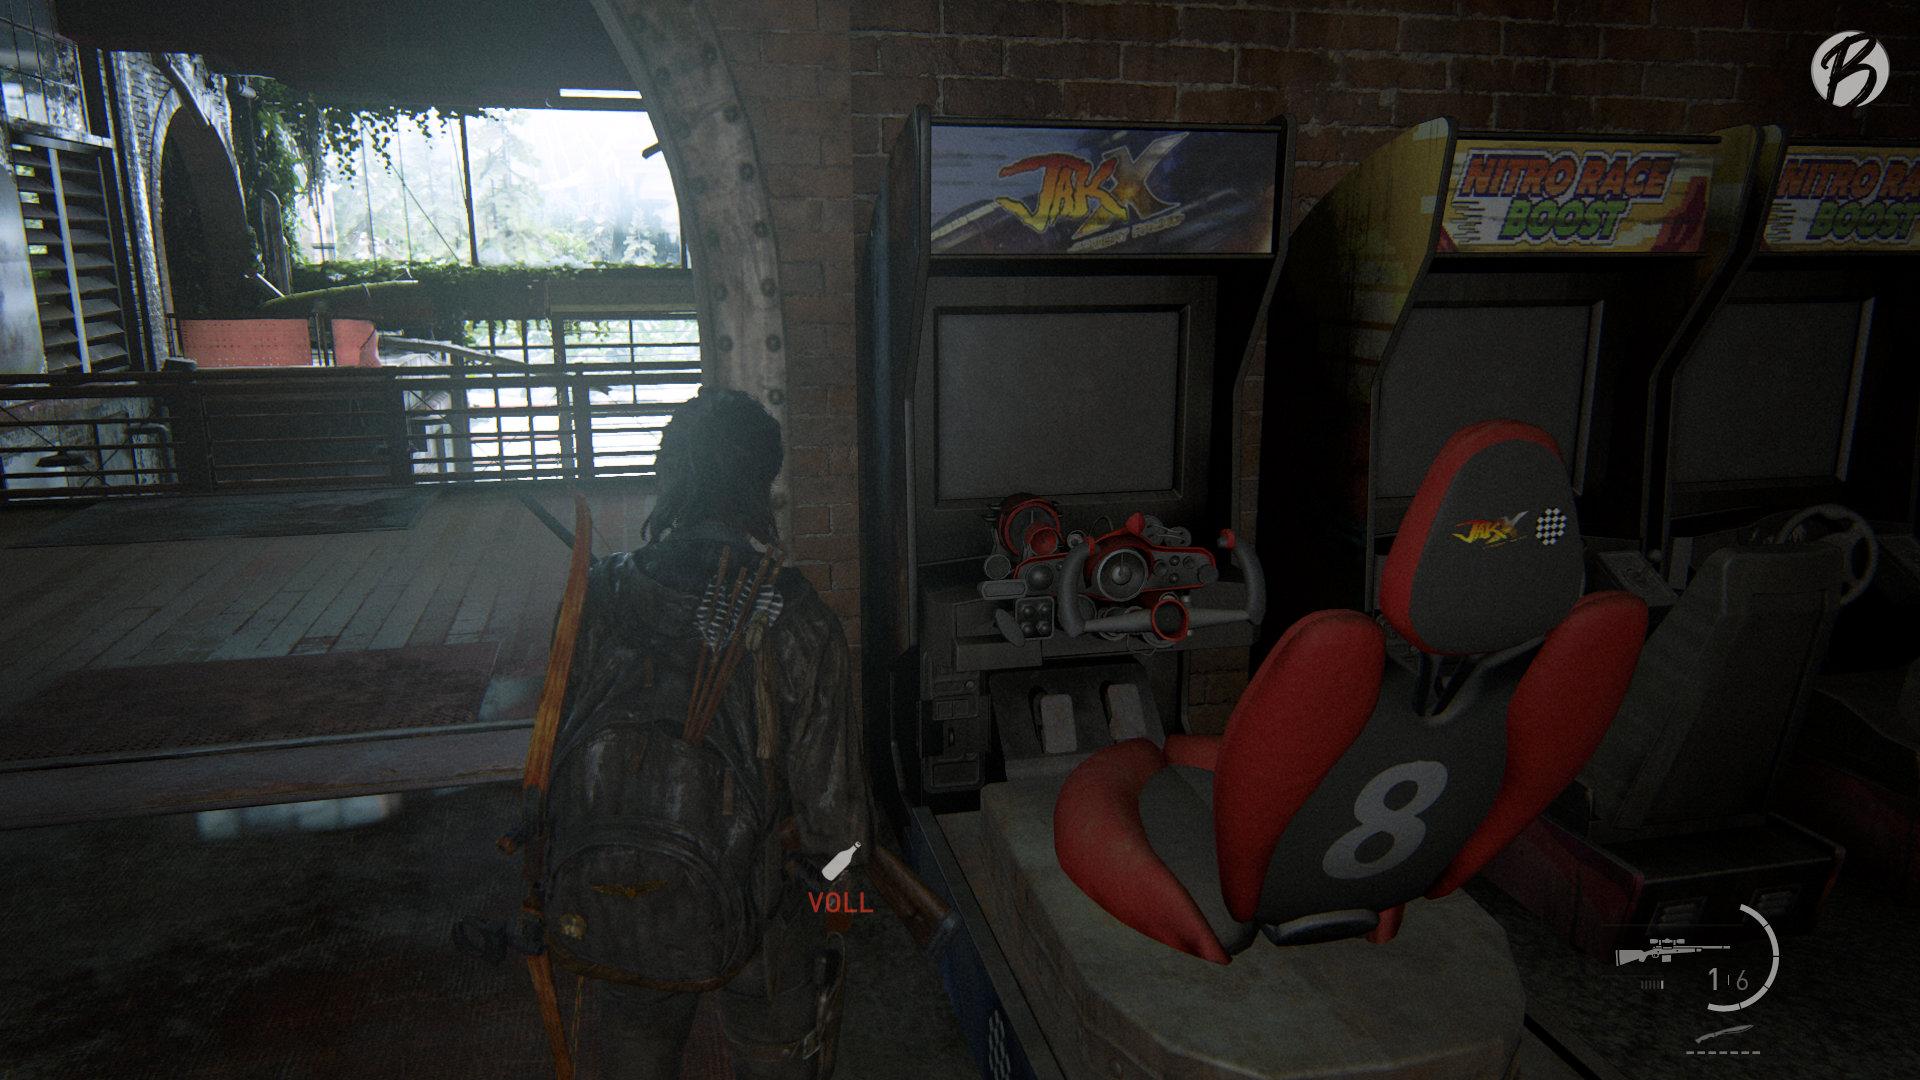 The Last of Us Part II - Spielautomat: Jak X: Combat Racing